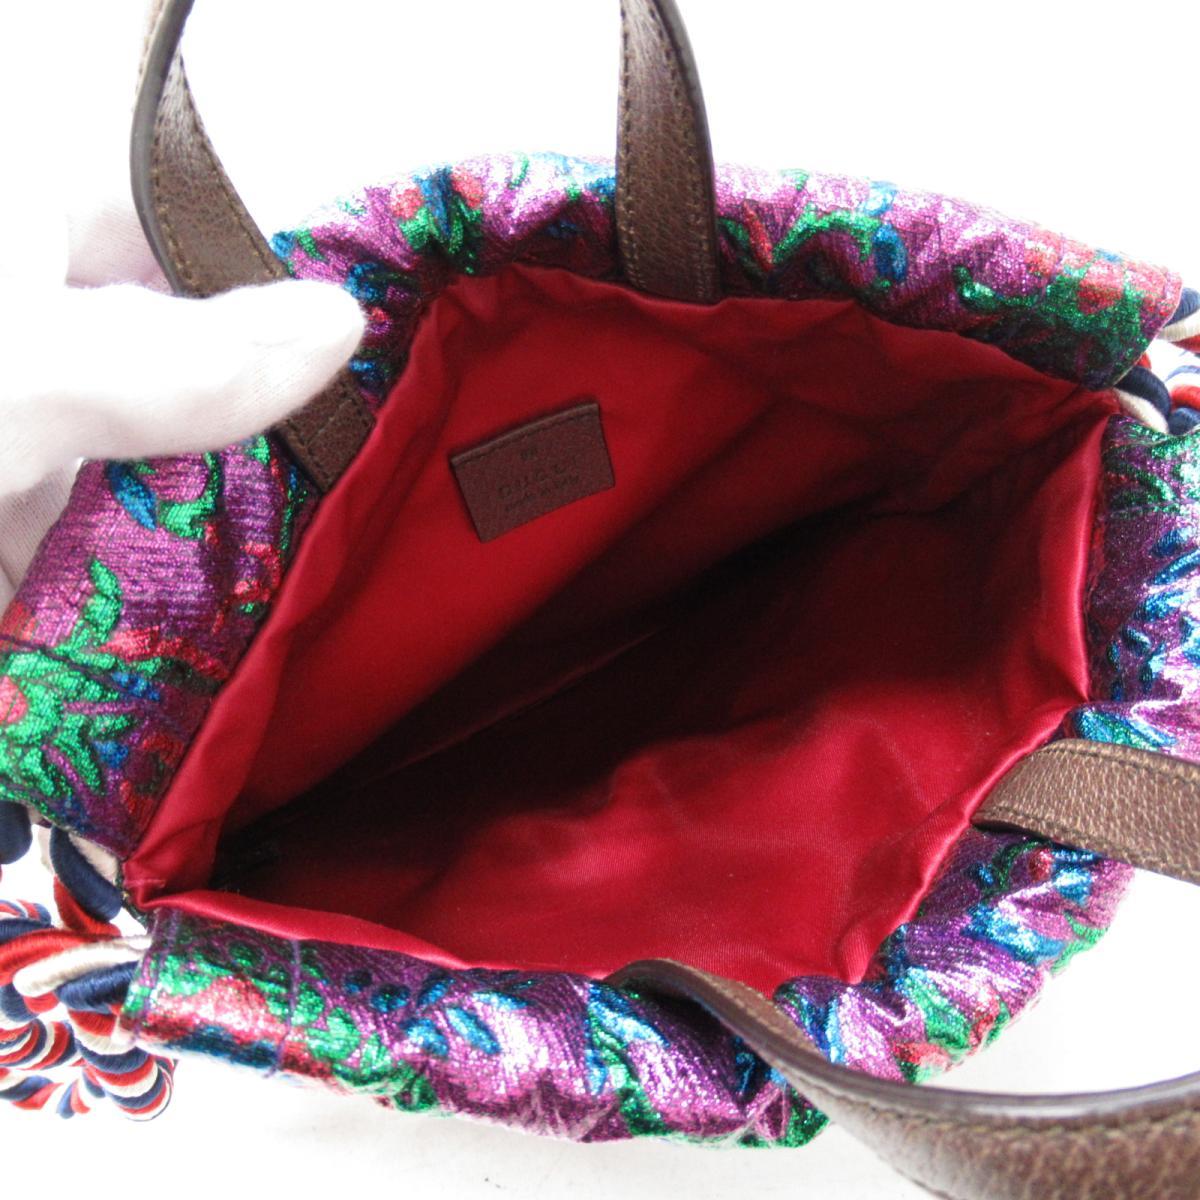 3672457964b Gucci backpack rucksack bag men gap Dis jacquard fabric x coating canvas  multicolored (470443)